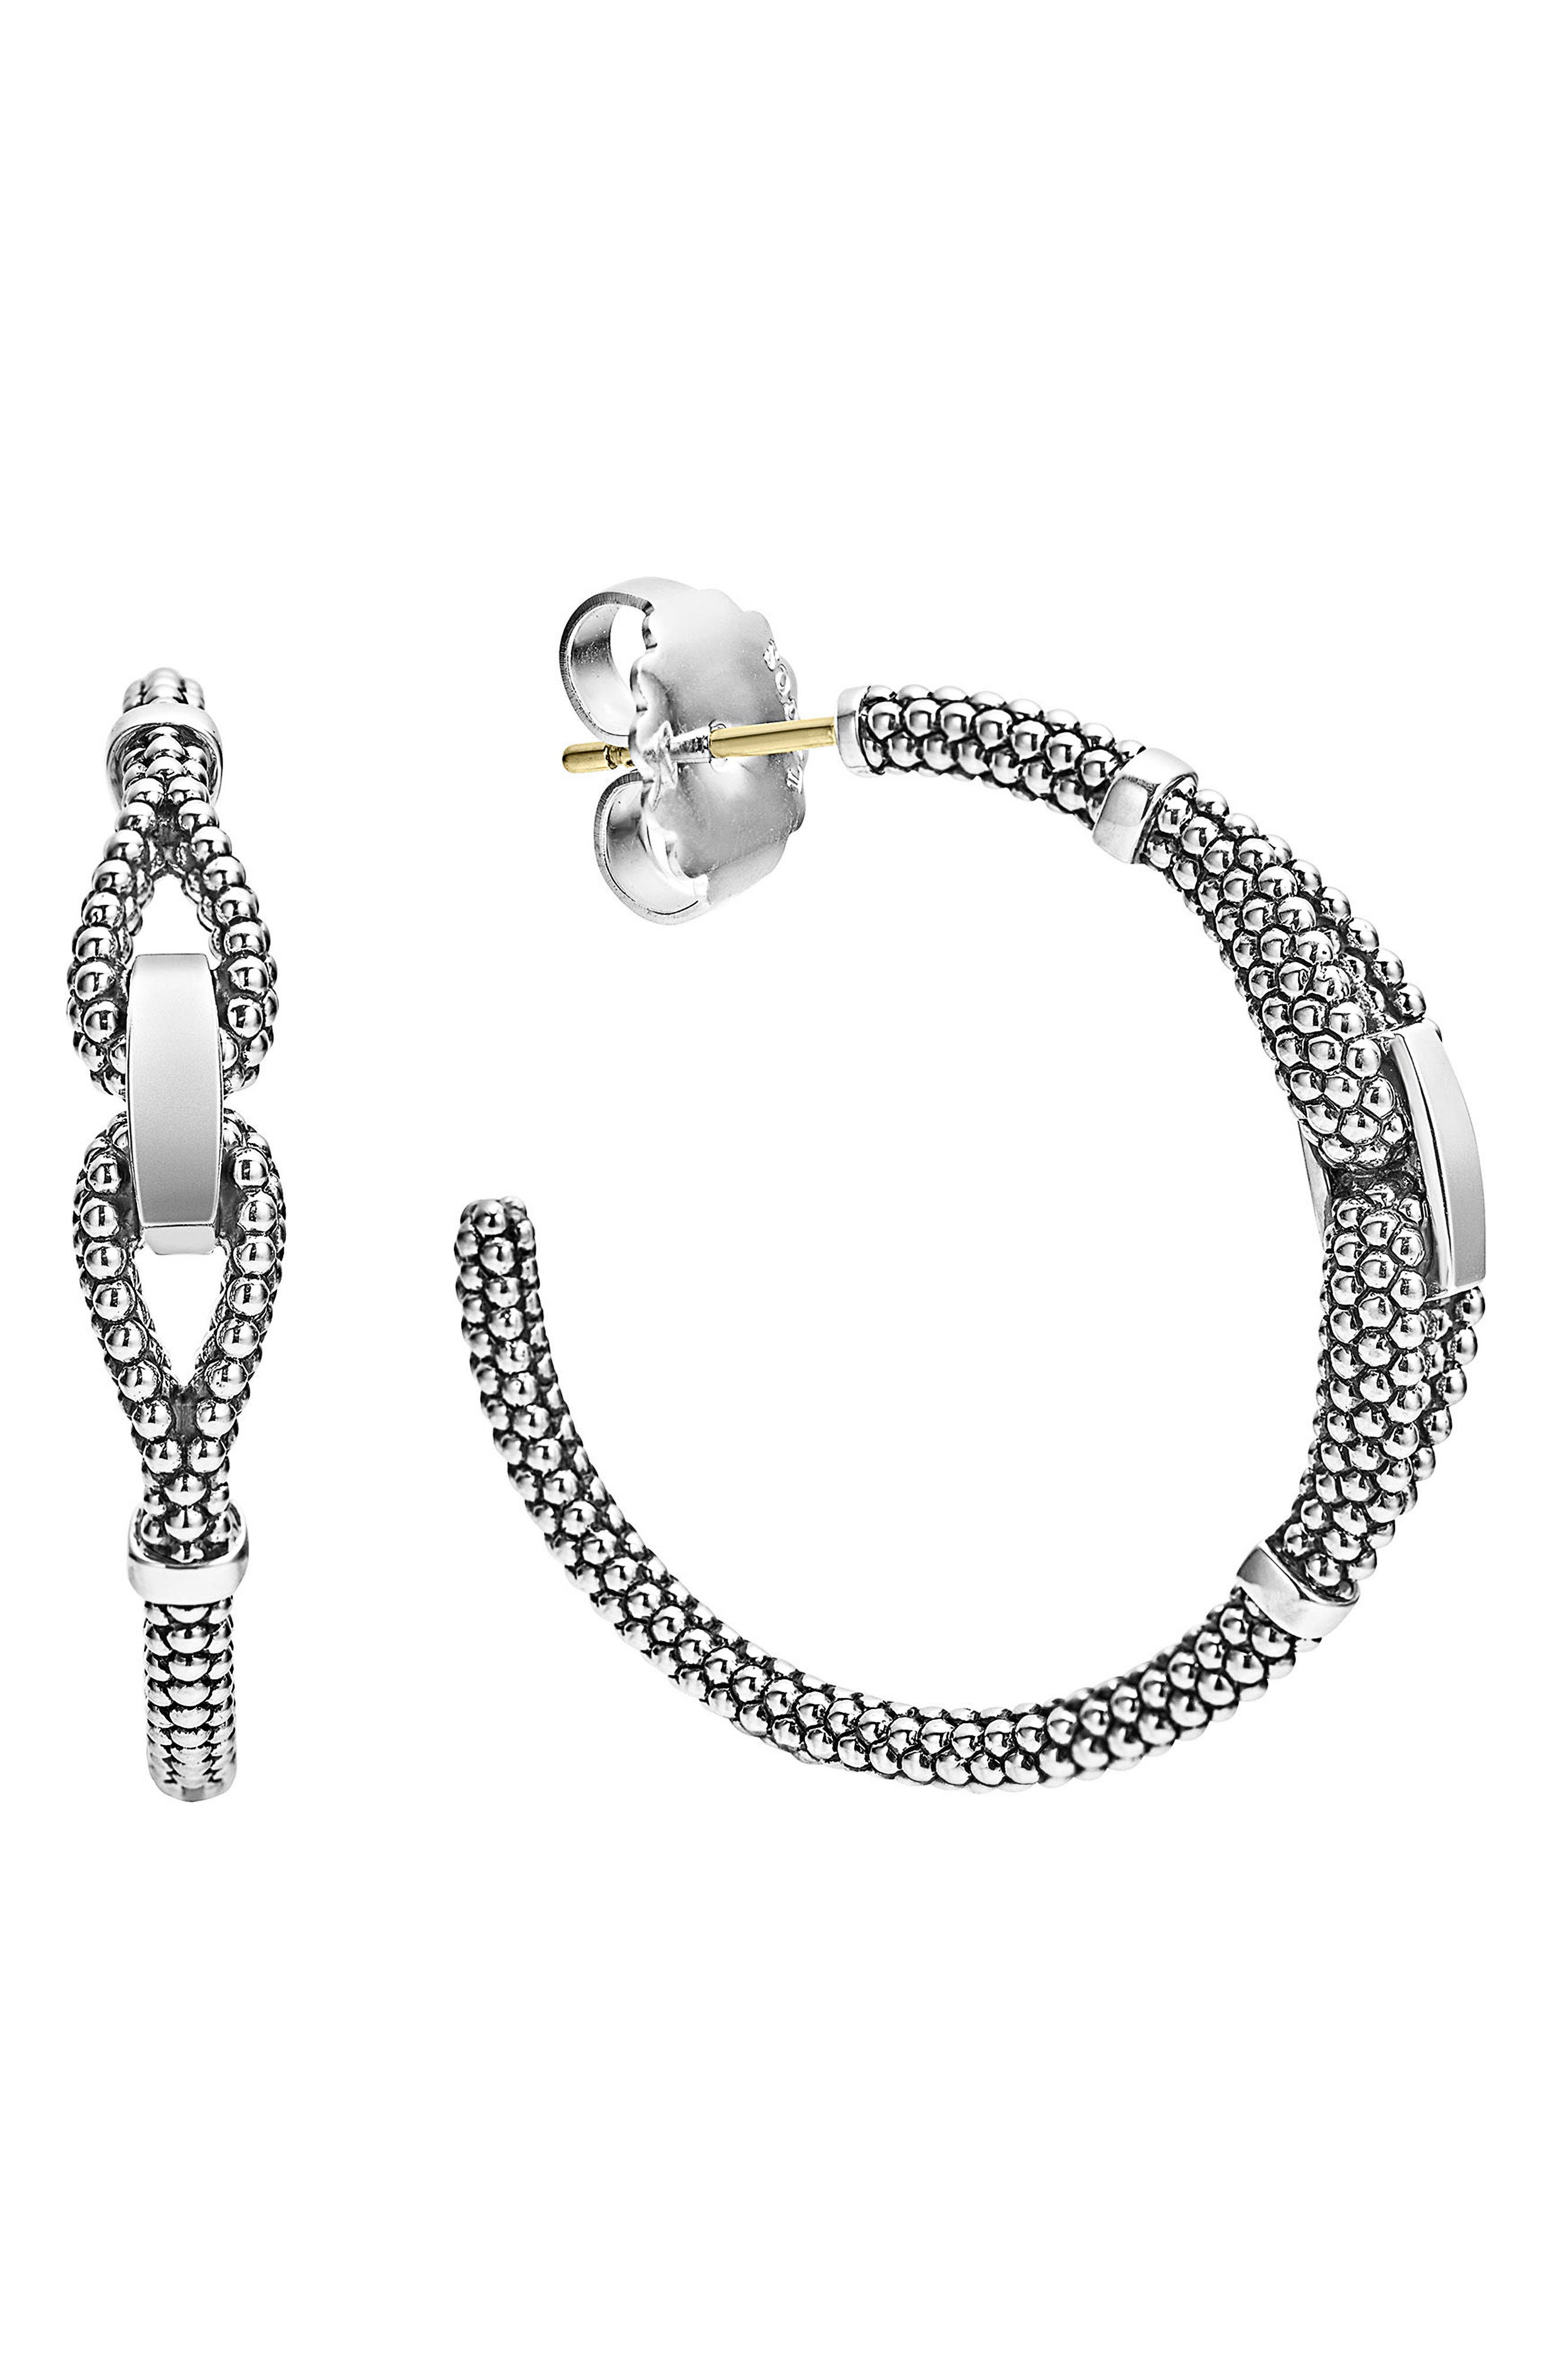 Derby Caviar Hoop Earrings,                         Main,                         color, Silver